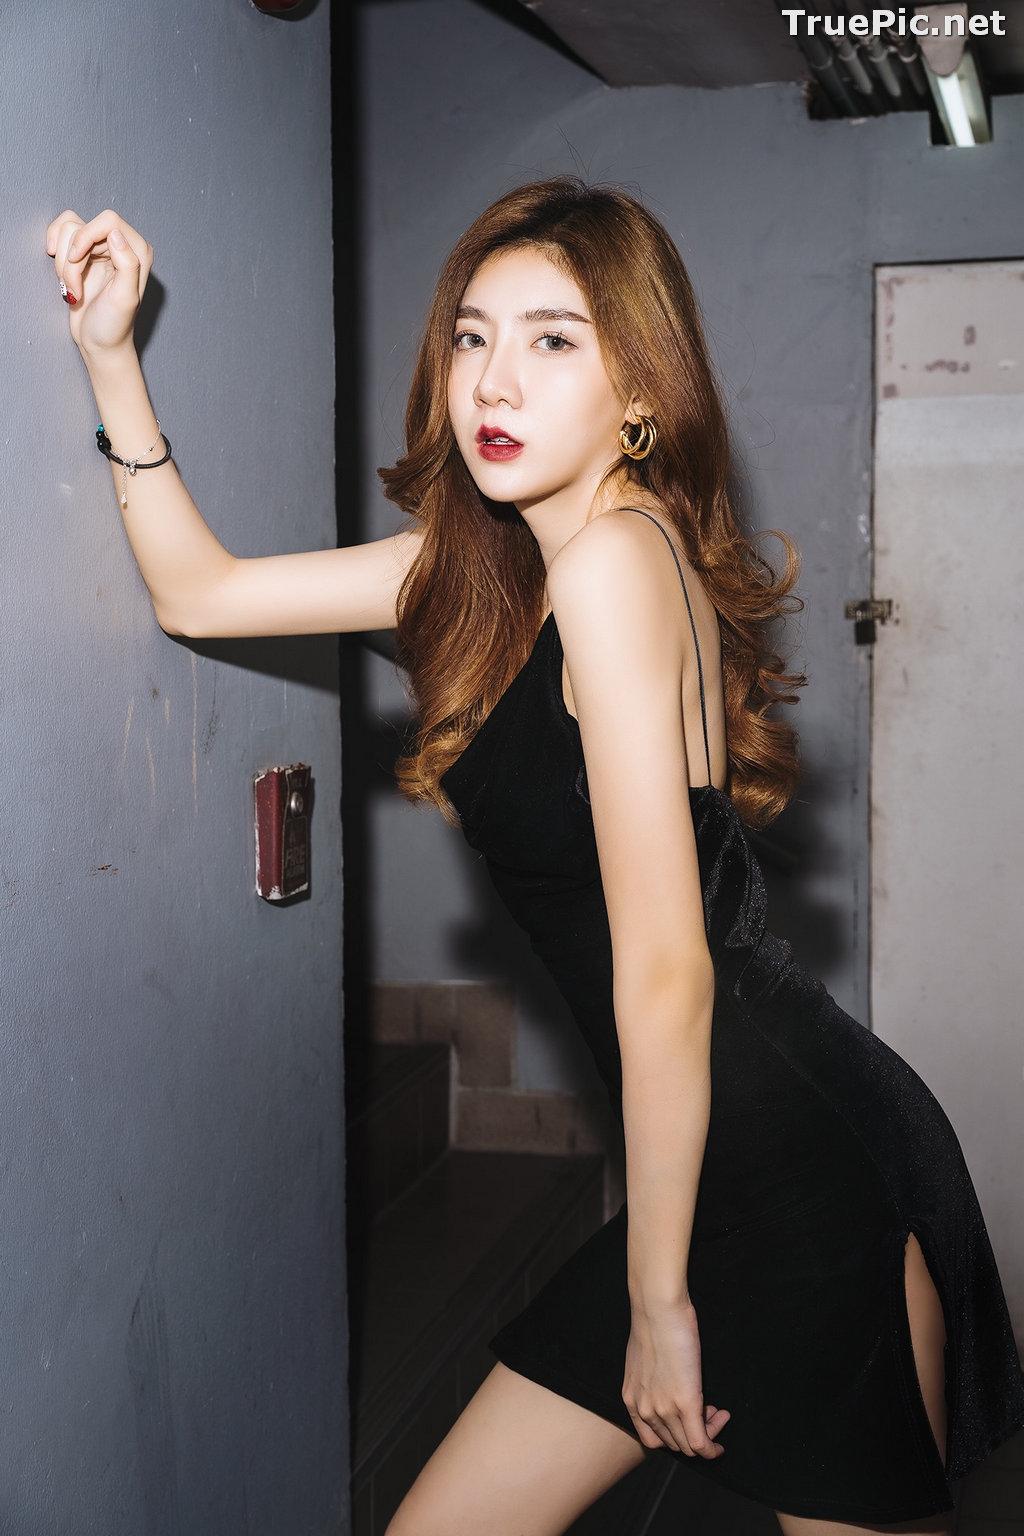 Image Thailand Model - Sasi Ngiunwan - Black For SiamNight - TruePic.net - Picture-29